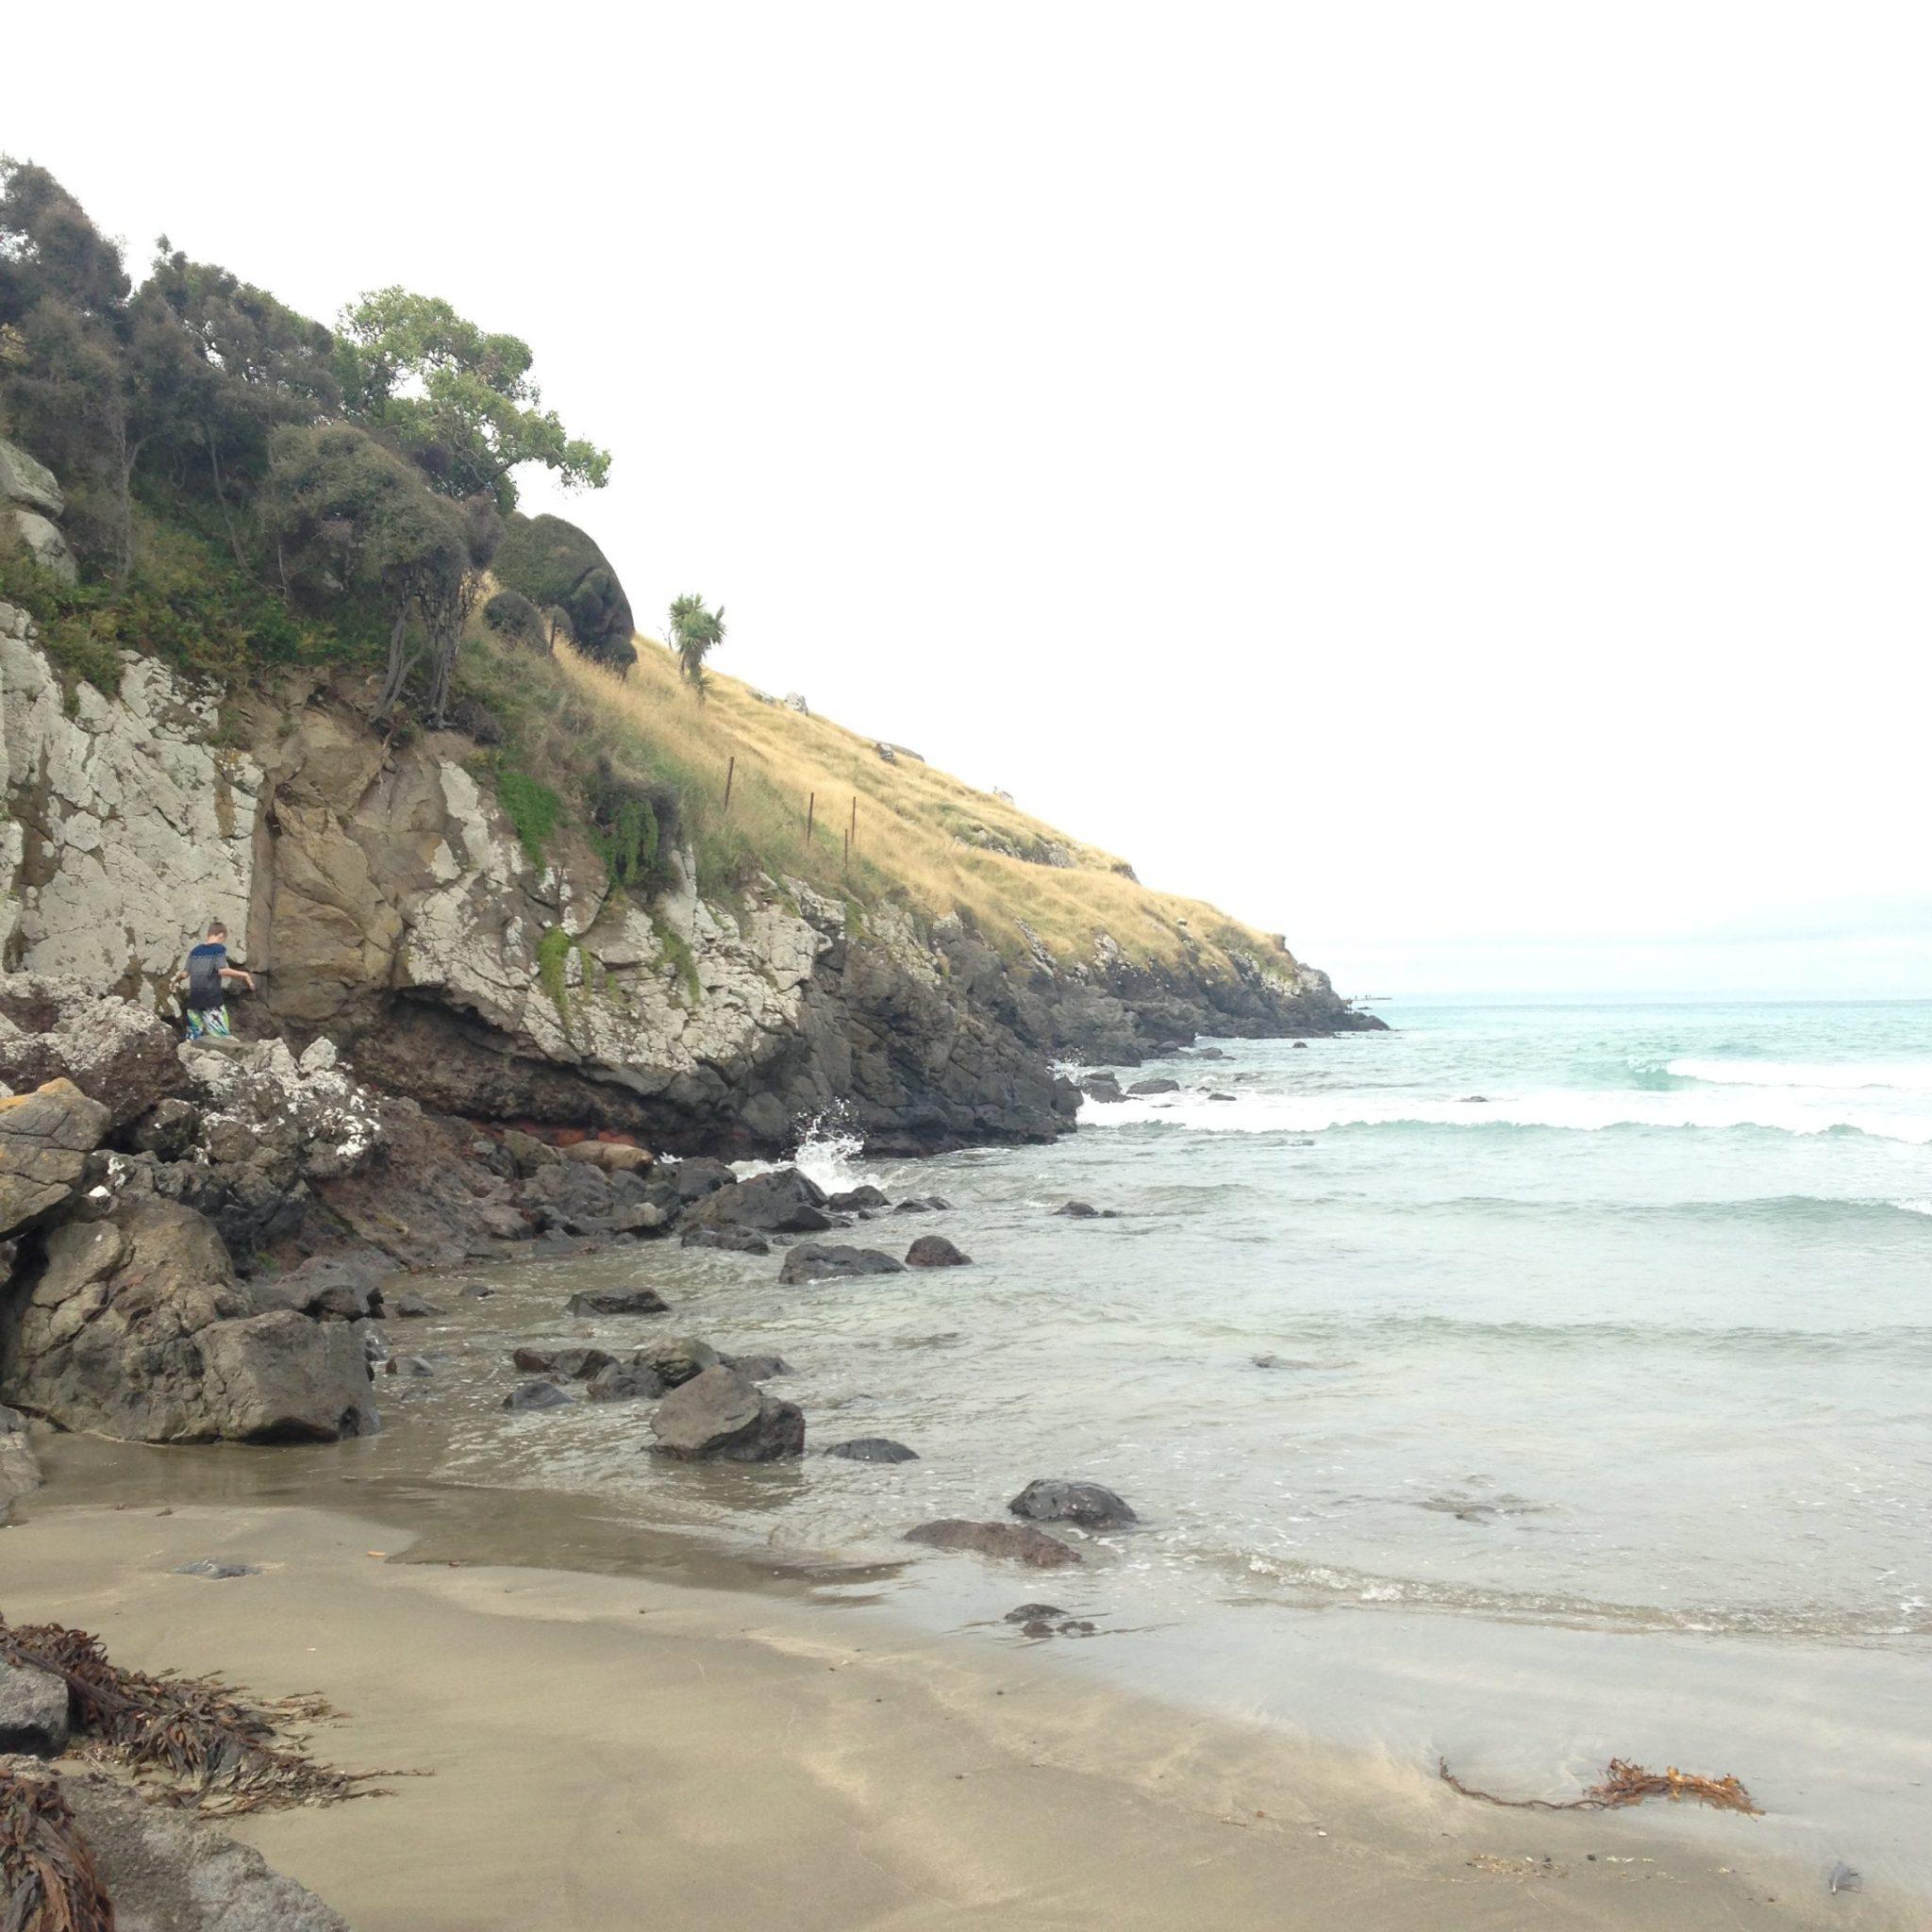 Seal, Lavericks Bay, Banks Peninsula, New Zealand.